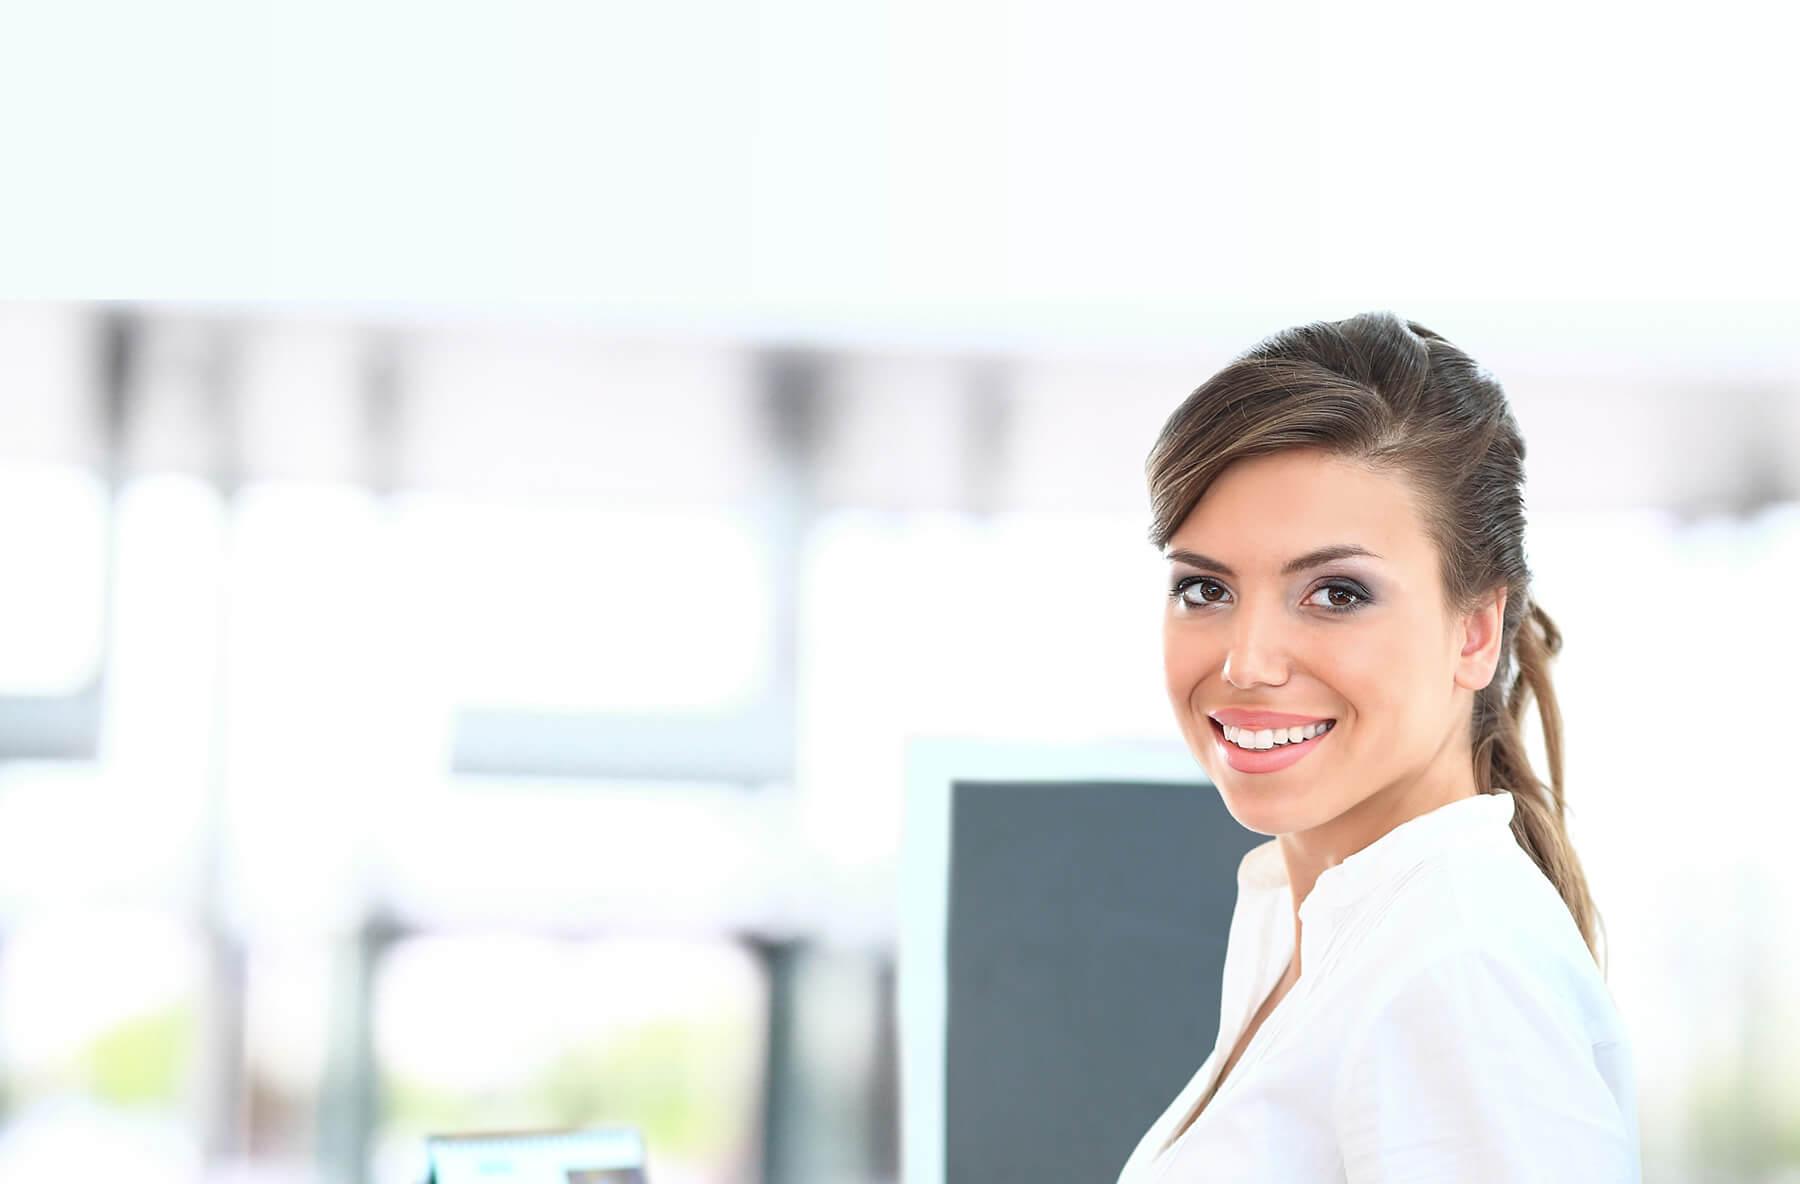 Sistema Para Centros de Beleza, Saúde e Bem-estar